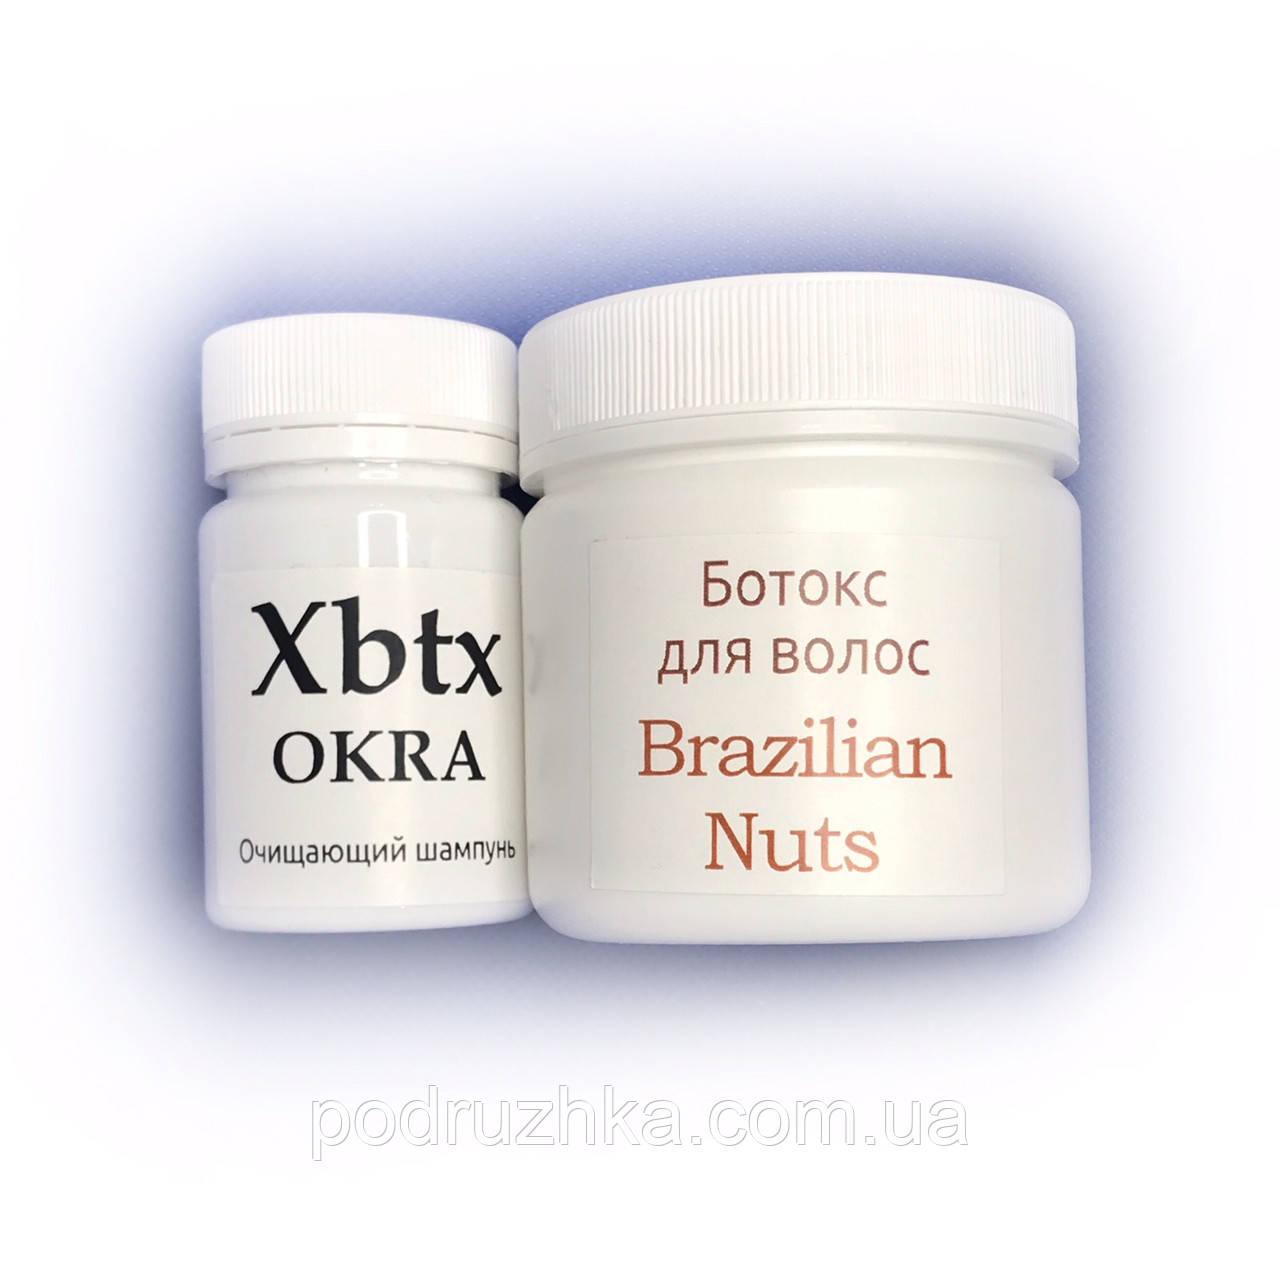 Набор ботокс для волос Brazilian Nuts 100/200 г